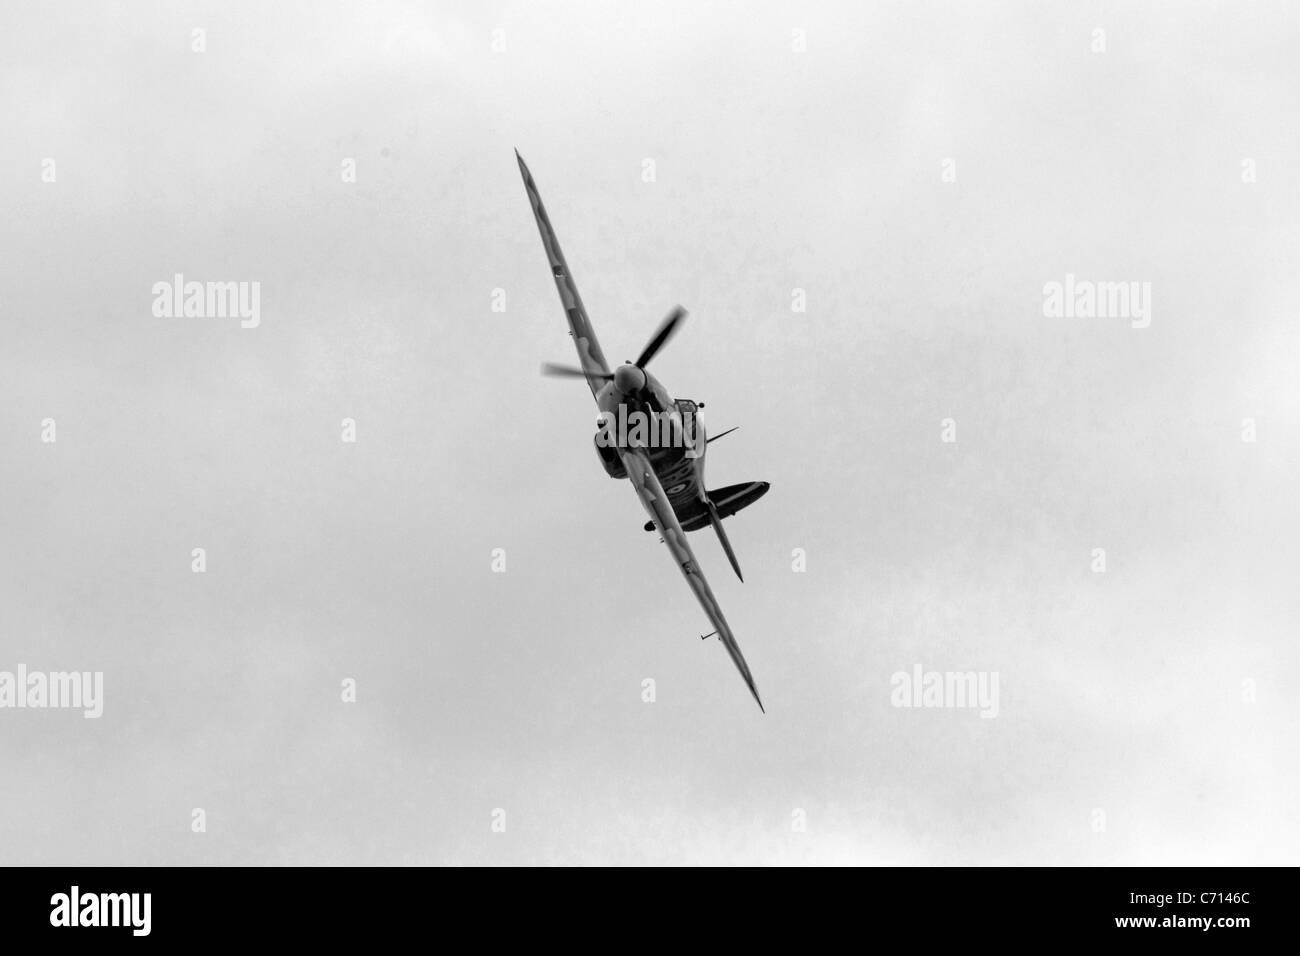 B/W photo of a WW2 British RAF Hawker Hurricane Plane Stock Photo